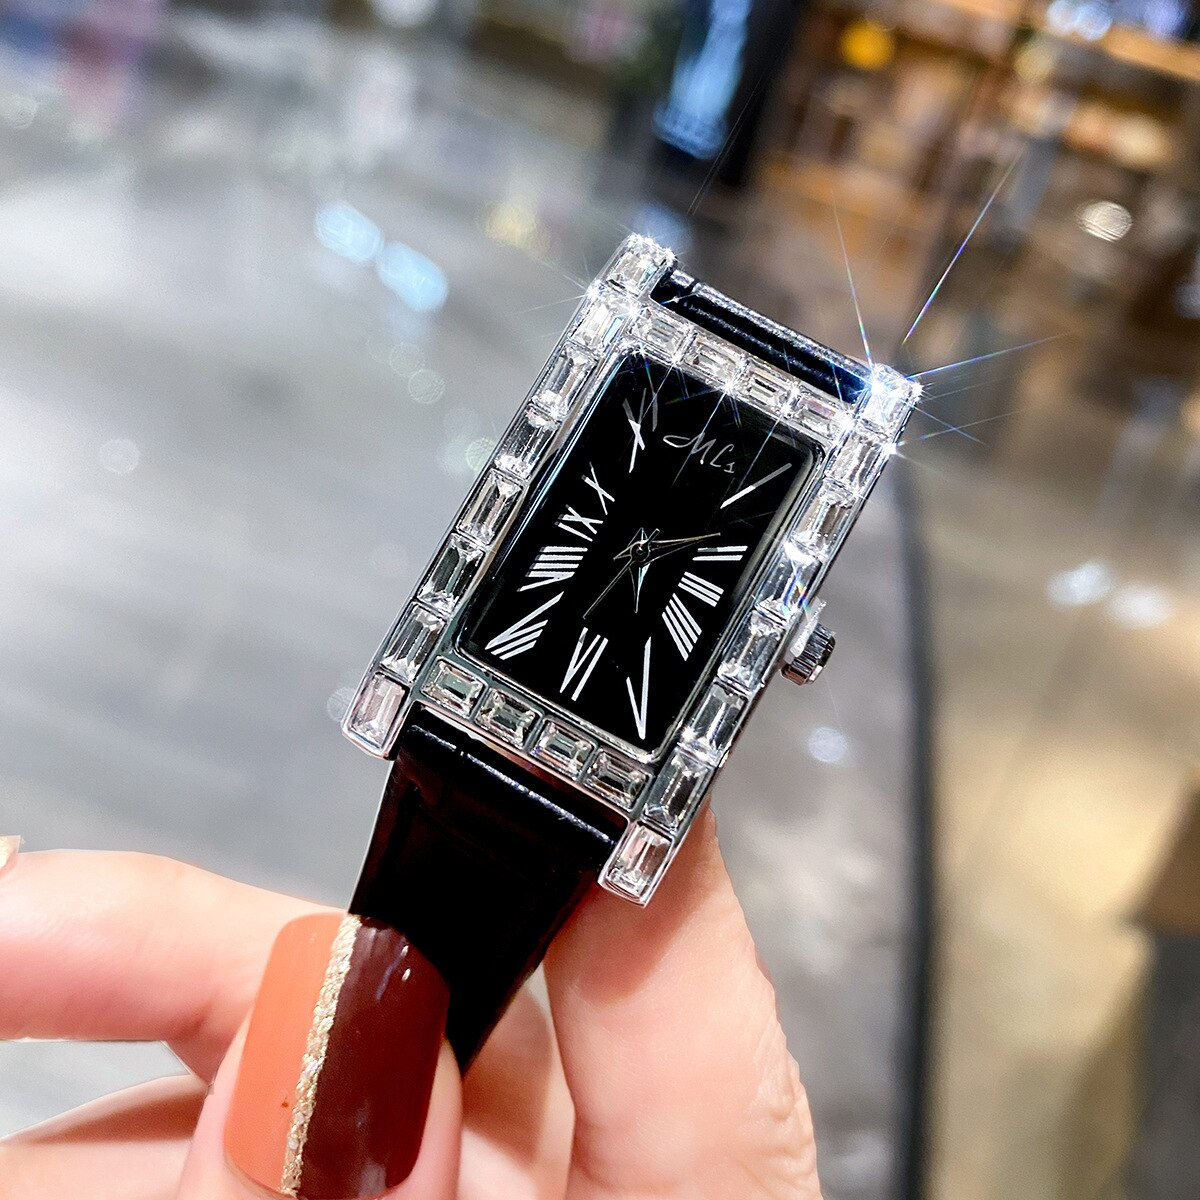 New Rectangle Diamond Fashion Women Watches Waterproof Lady Top Luxury Brand Ladies Casual Bracelet Crystal Watches Clock Box